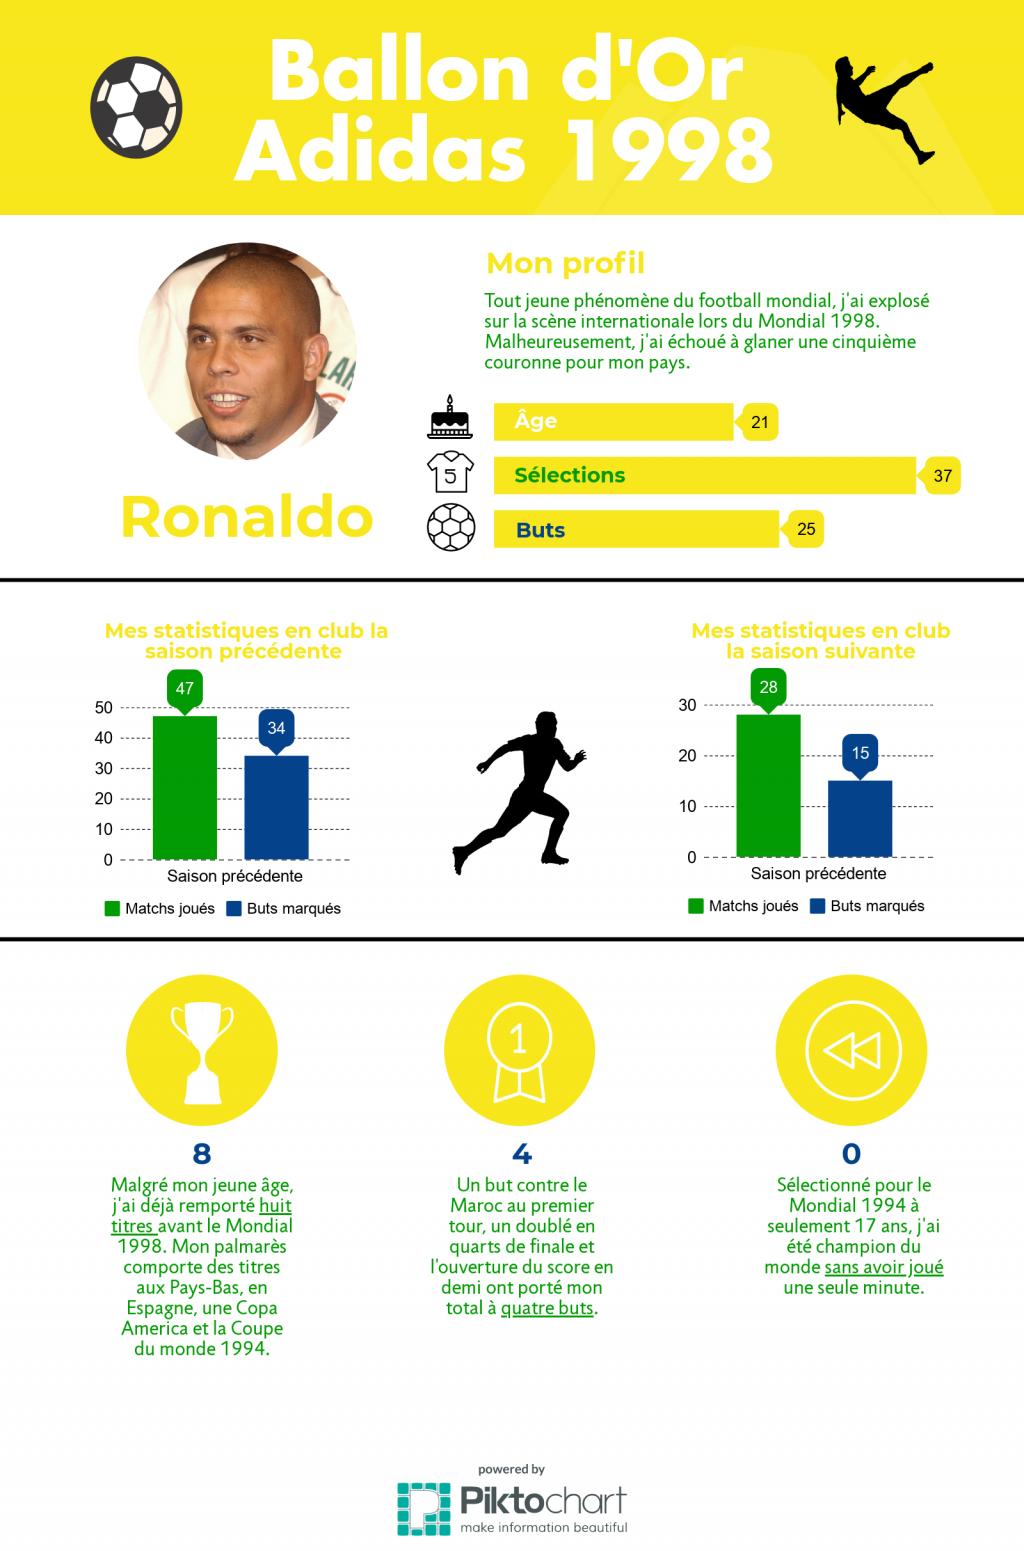 ronaldo-1998-ballon-dor-adidas-foot-dinfographies